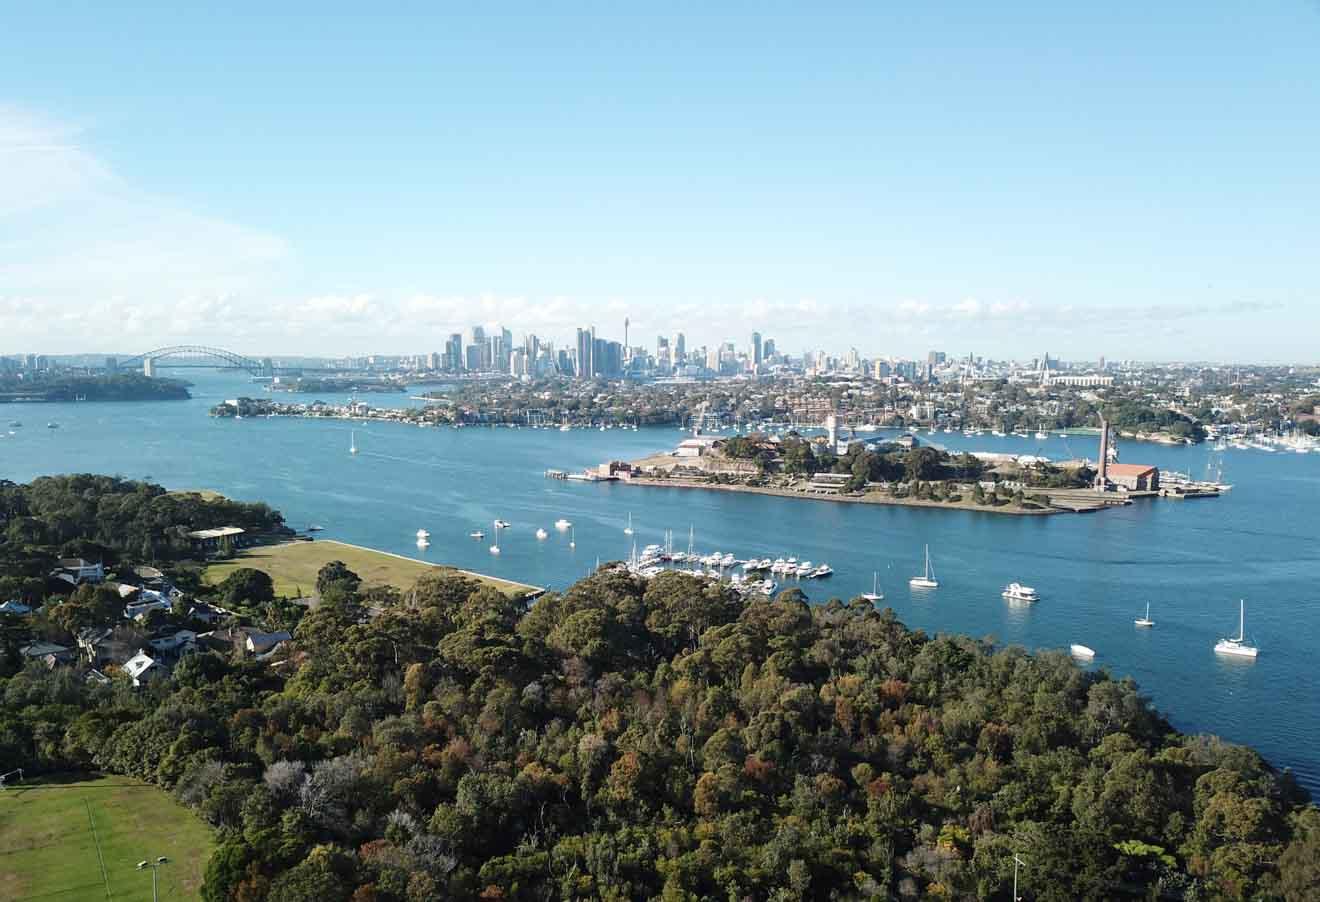 Vue aérienne de Cockatoo Island, Sydney Tour